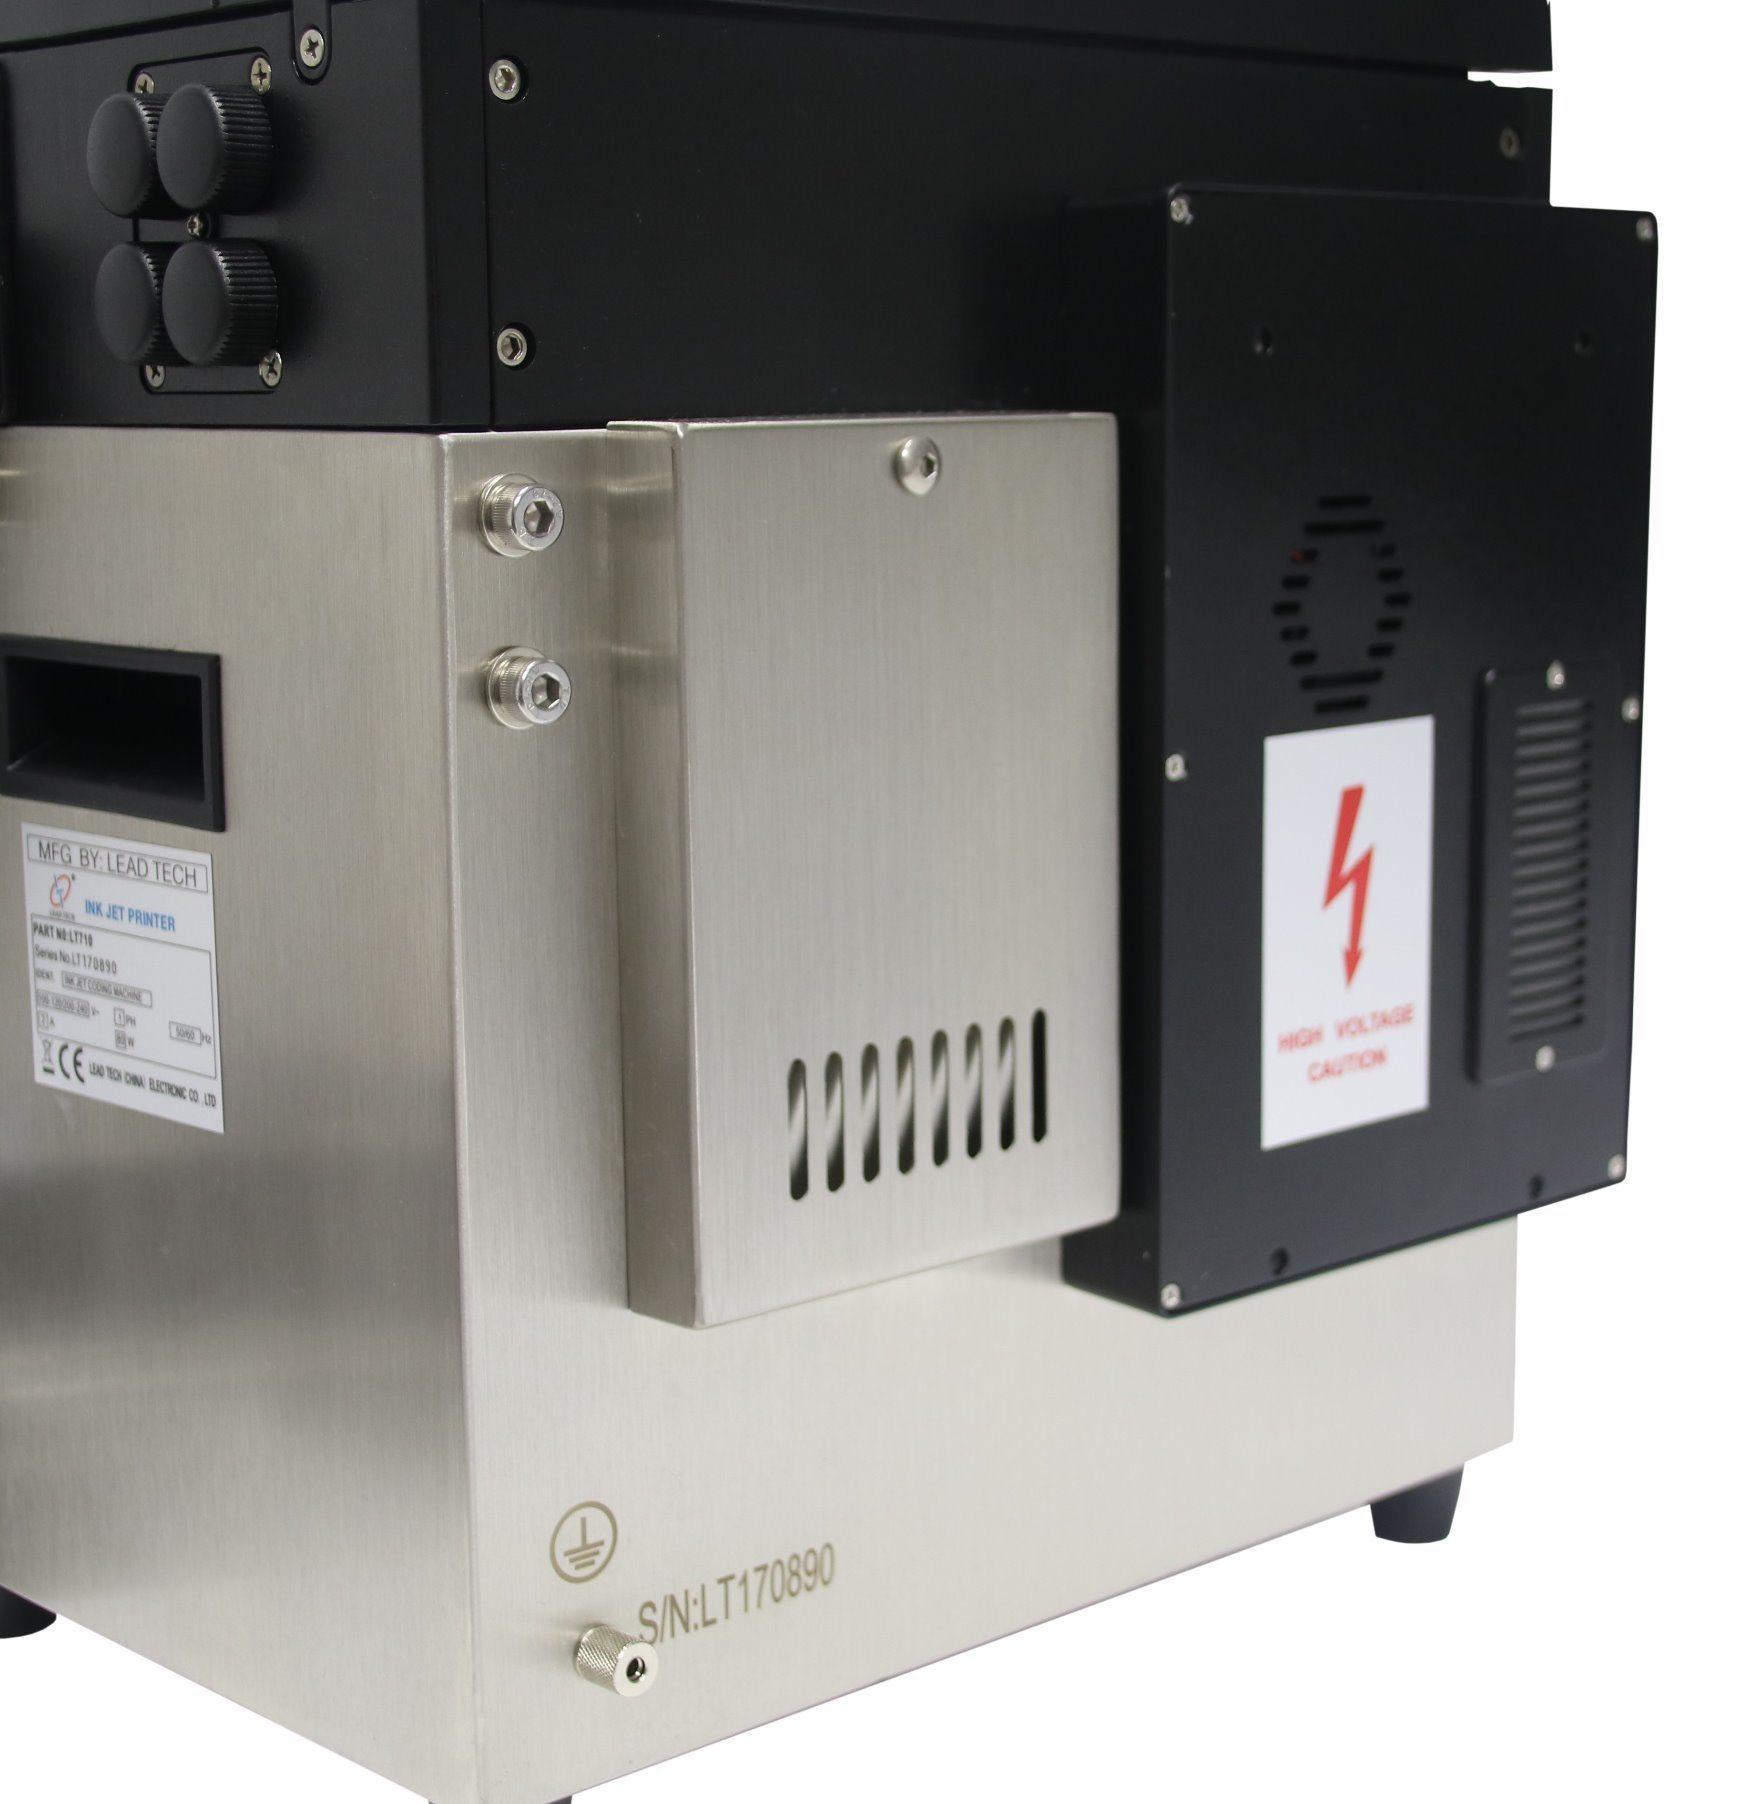 Lead Tech Lt760 Continuous 1d Barcode Coding Inkjet Printer